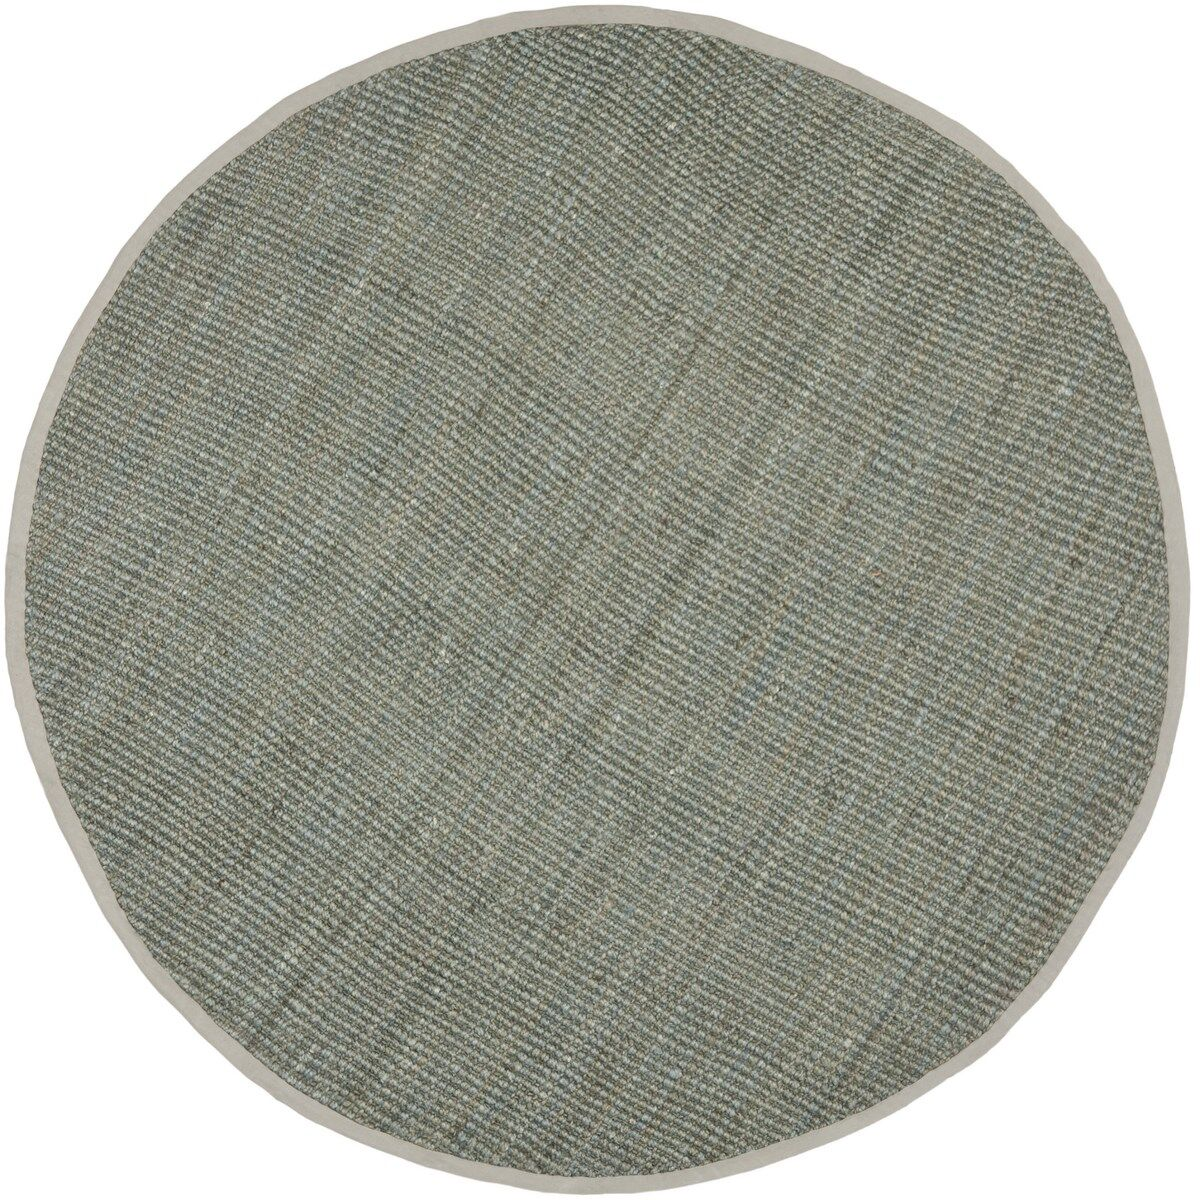 Calidia Hand-Loomed Gray Area Rug Rug Size: Rectangle 11' x 15'